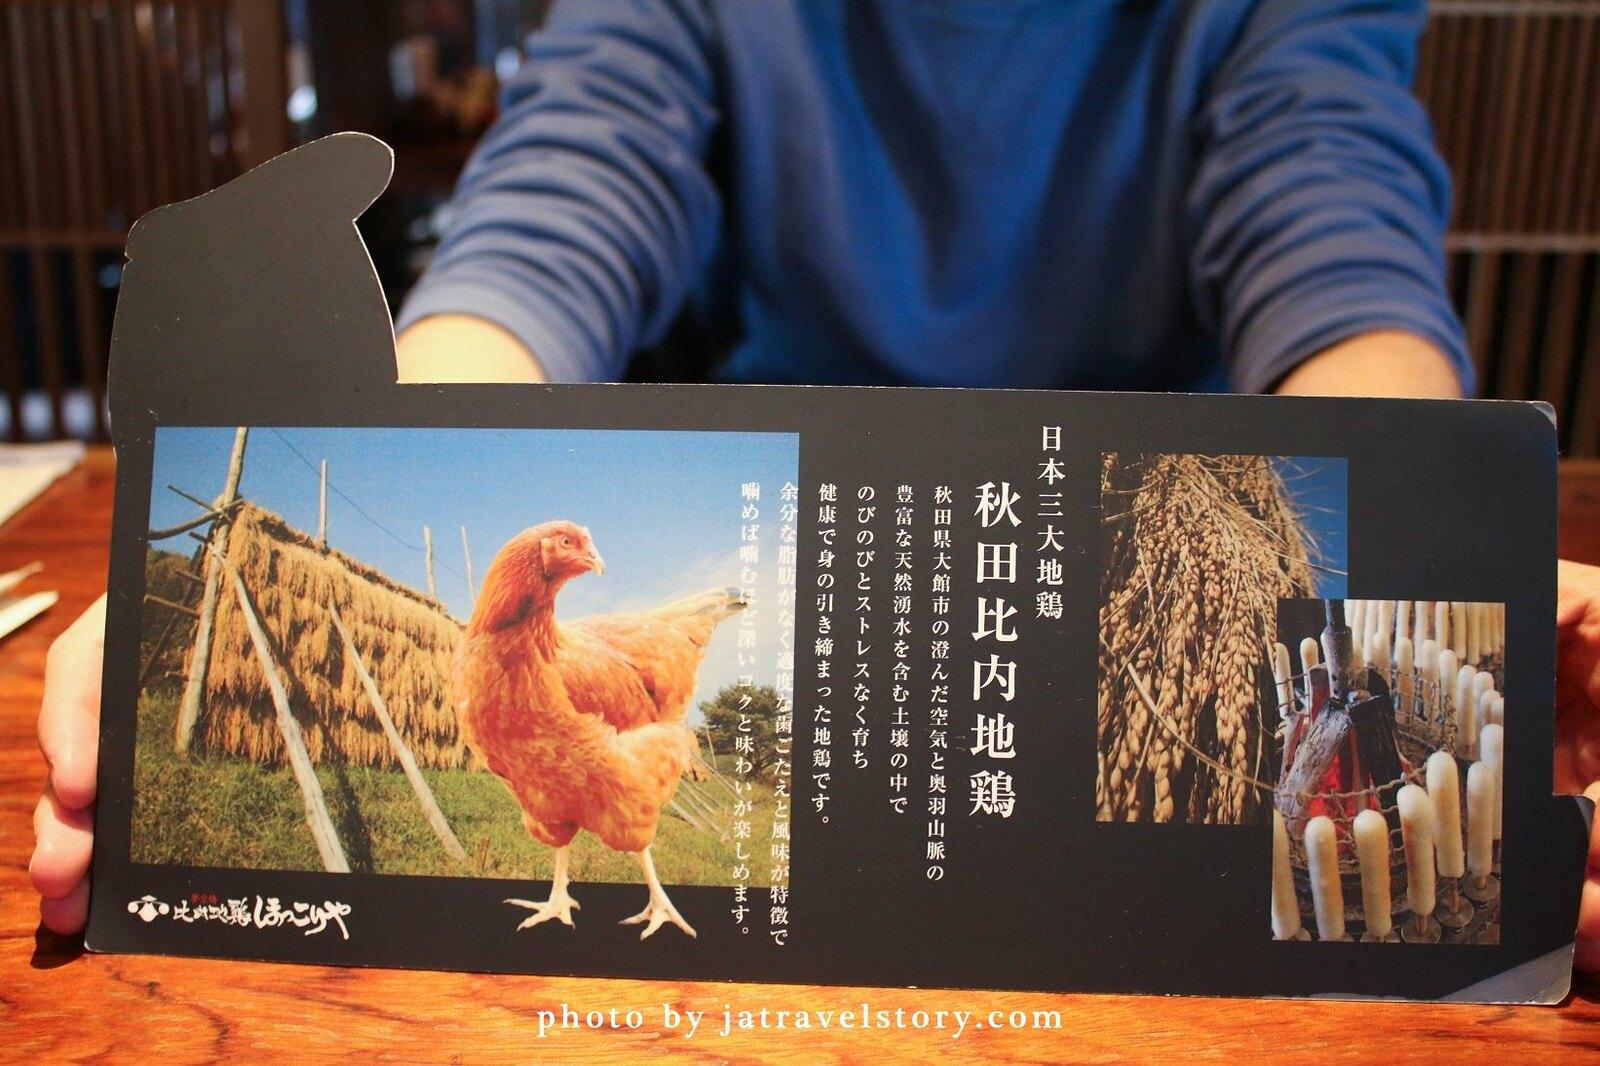 【滋賀美食/彥根城美食】比内地雞 ほっこりや 比內地雞親子丼肉Q彈有炭香味,好吃有特色! @J&A的旅行